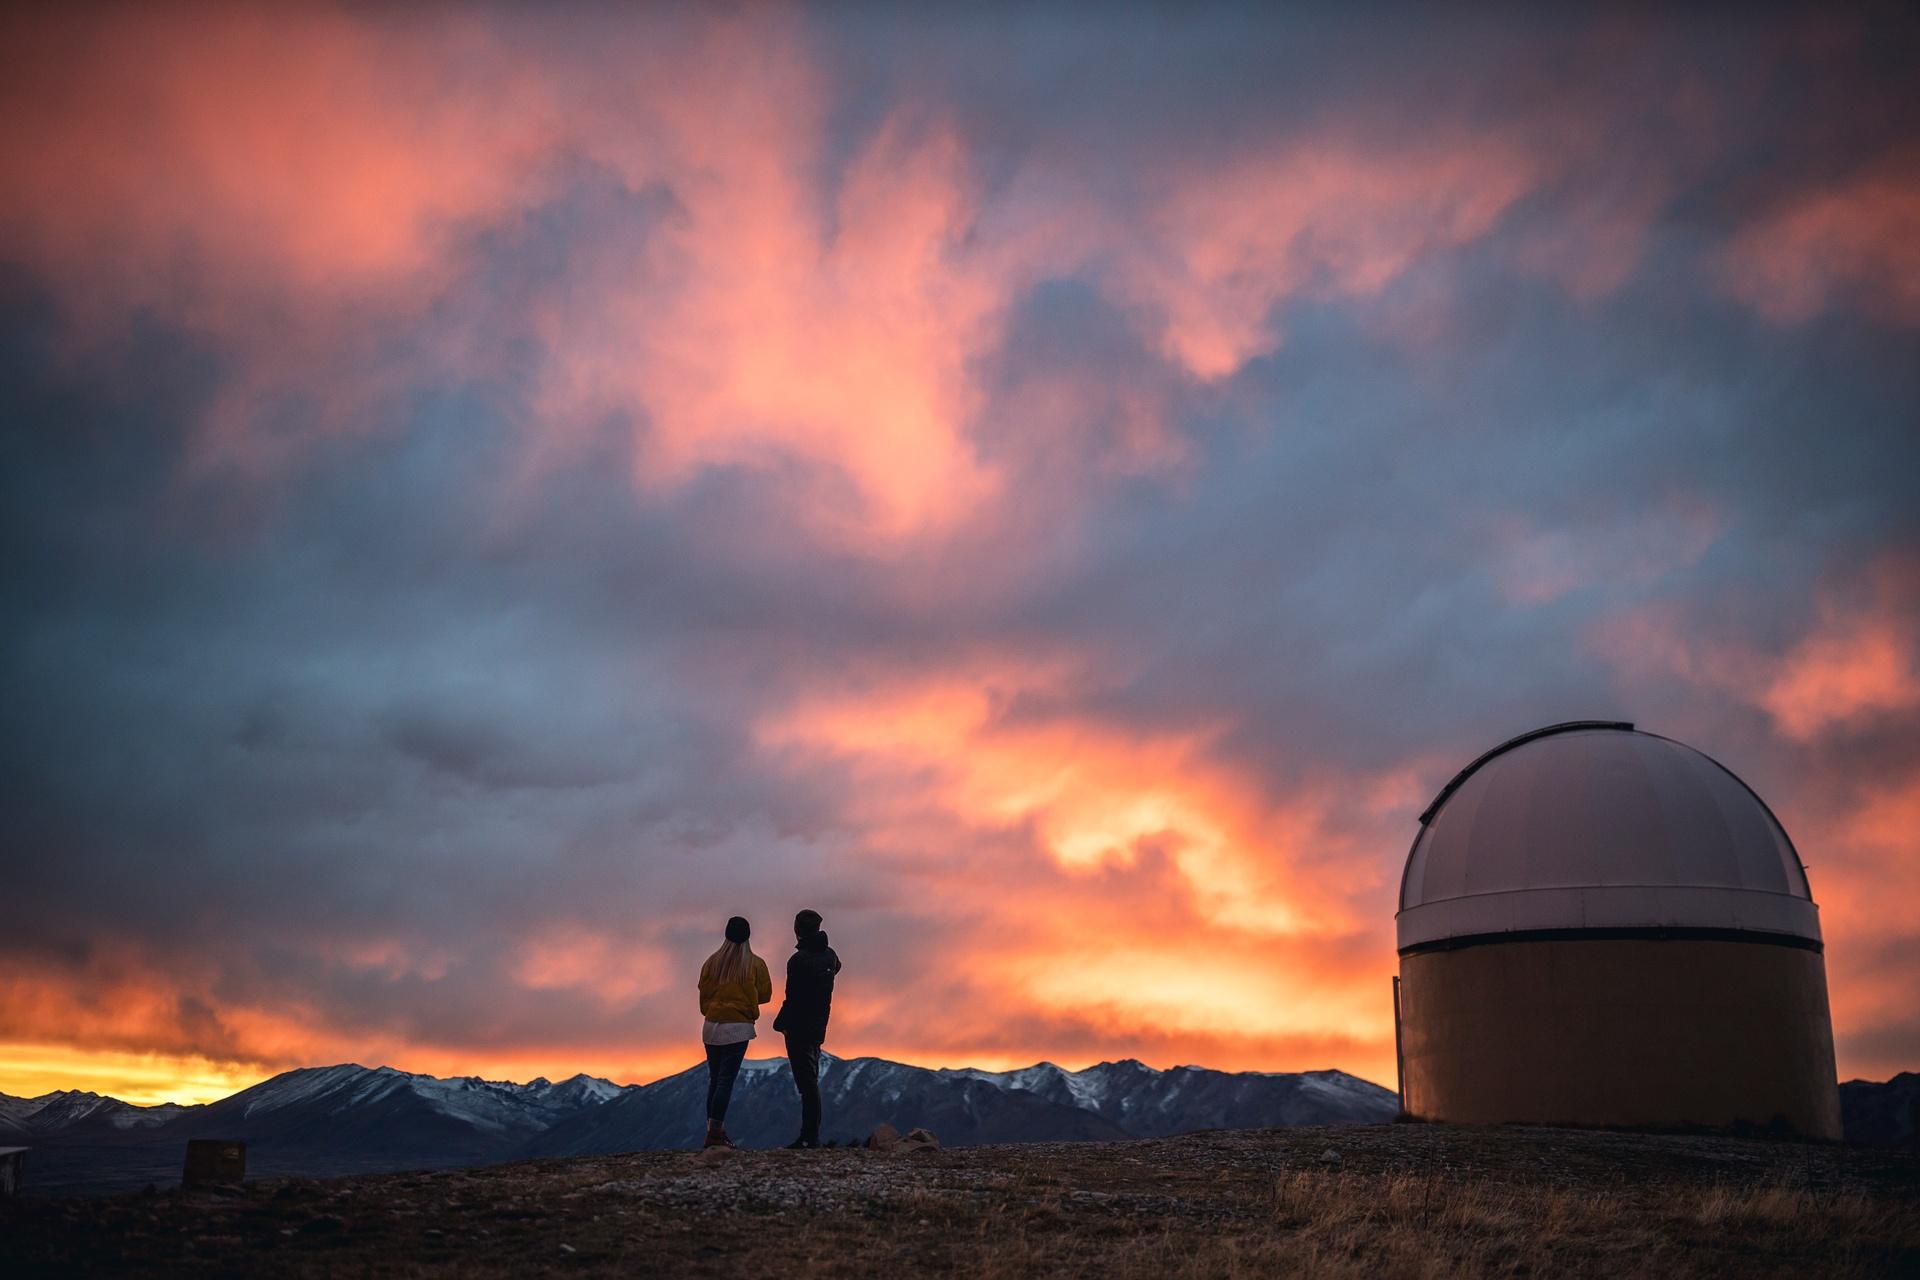 Tekapo Mt. John Observatory image courtesy Miles Holden and TNZ